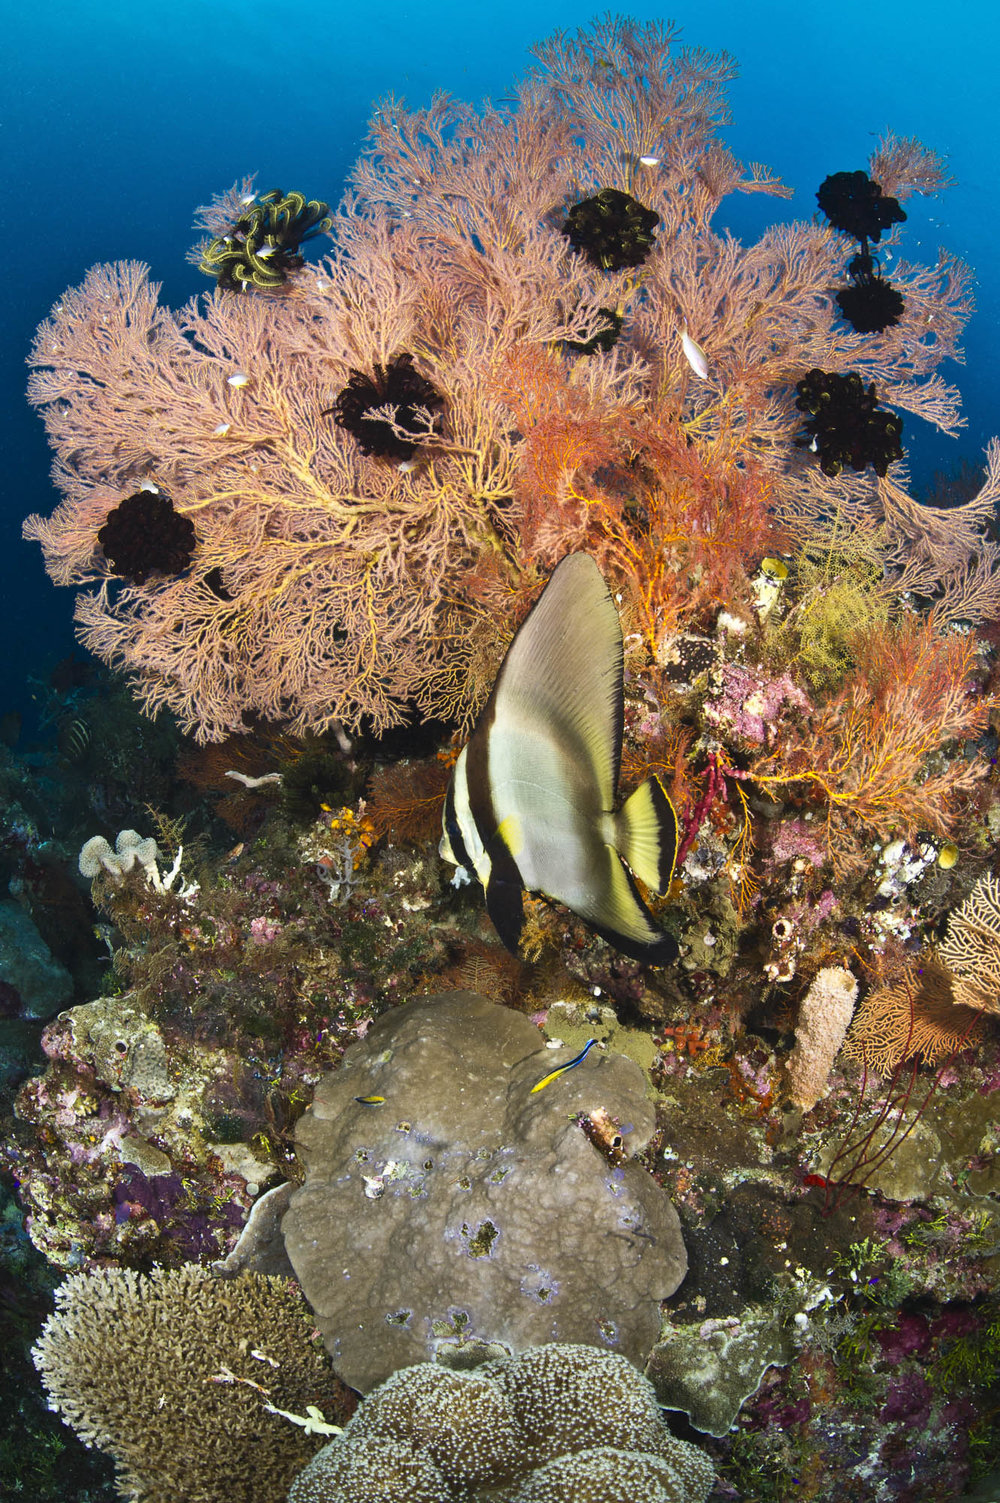 Wakatobi , Indonesia credit: wartren baverstock / coral reef image bank